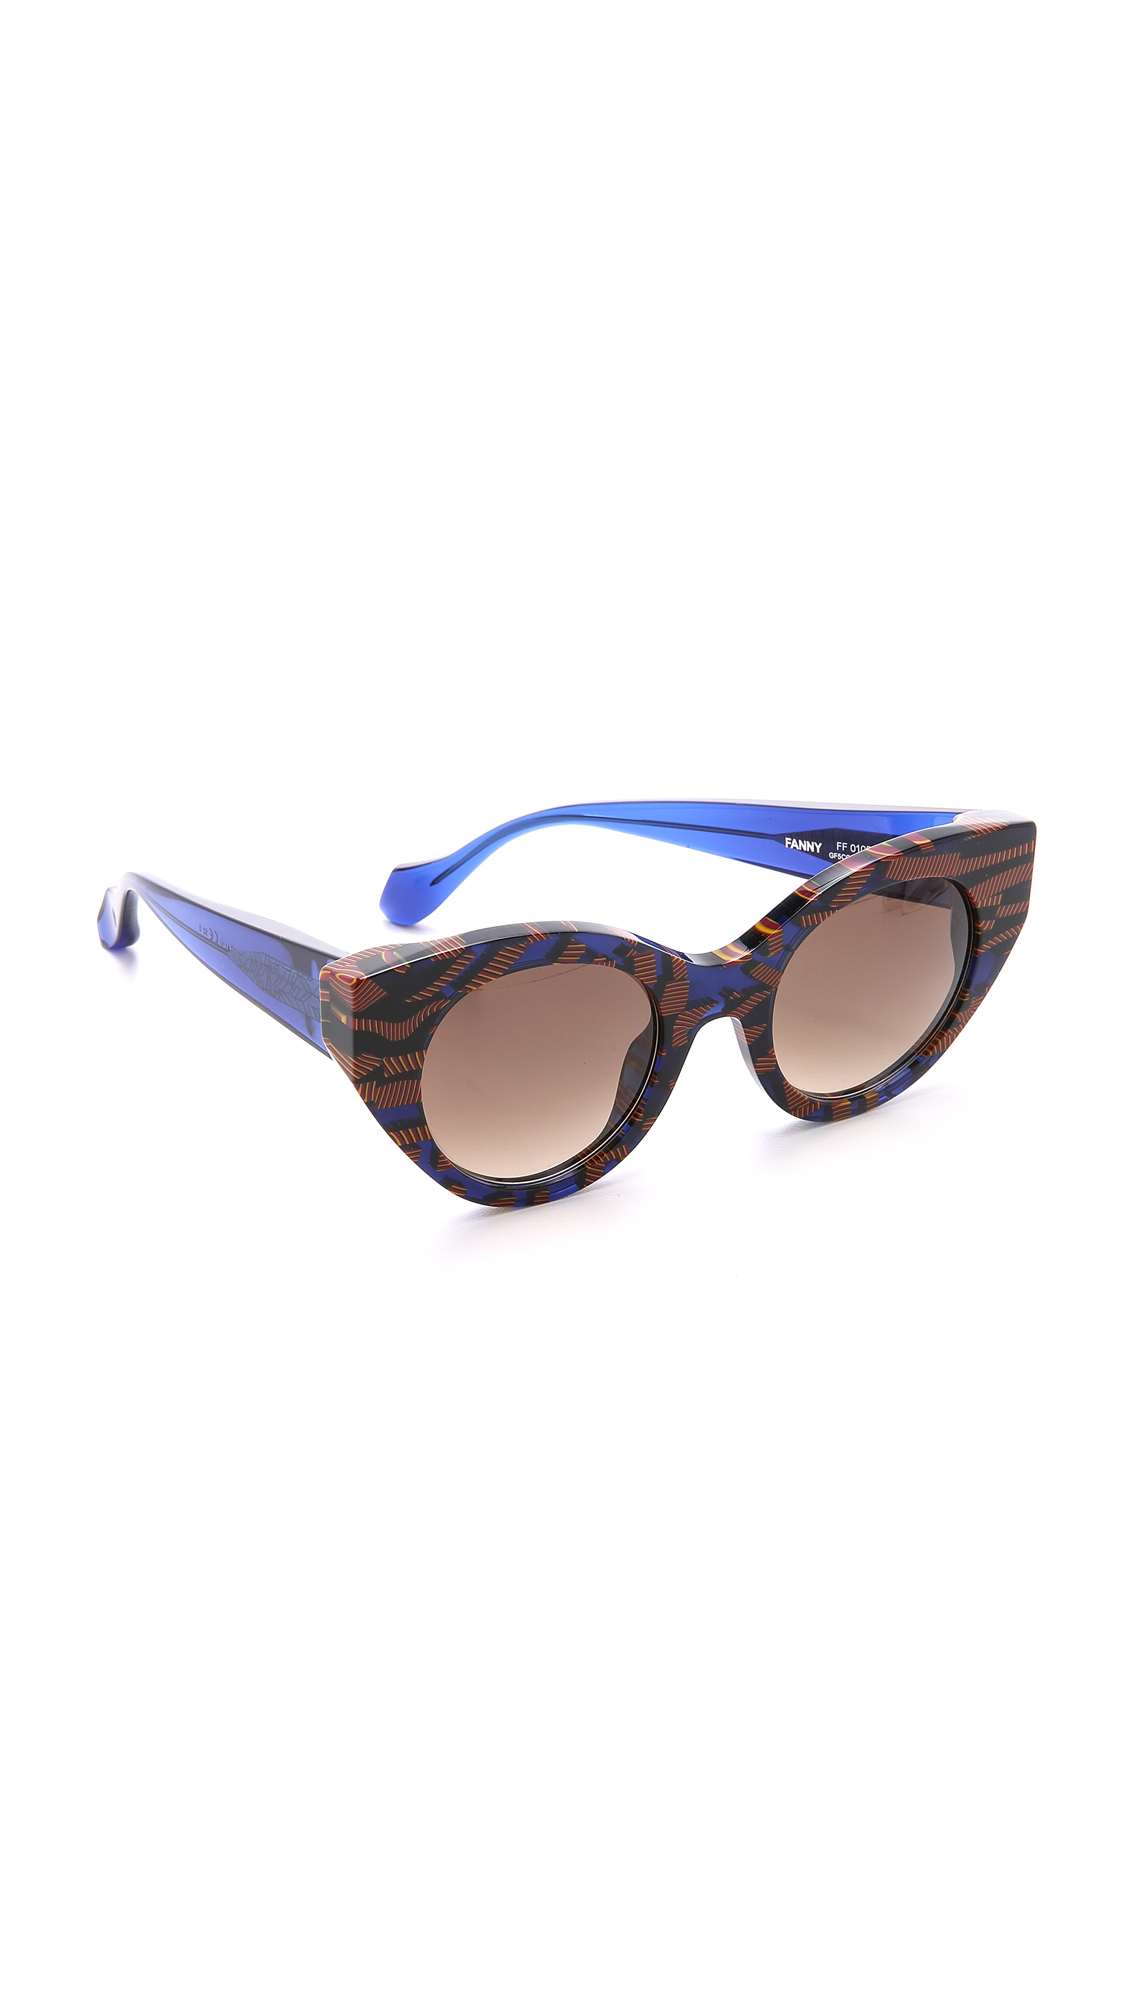 Fendi Thierry Lasry X Cat Eye Sunglasses - Blue Snake Multi/Brown